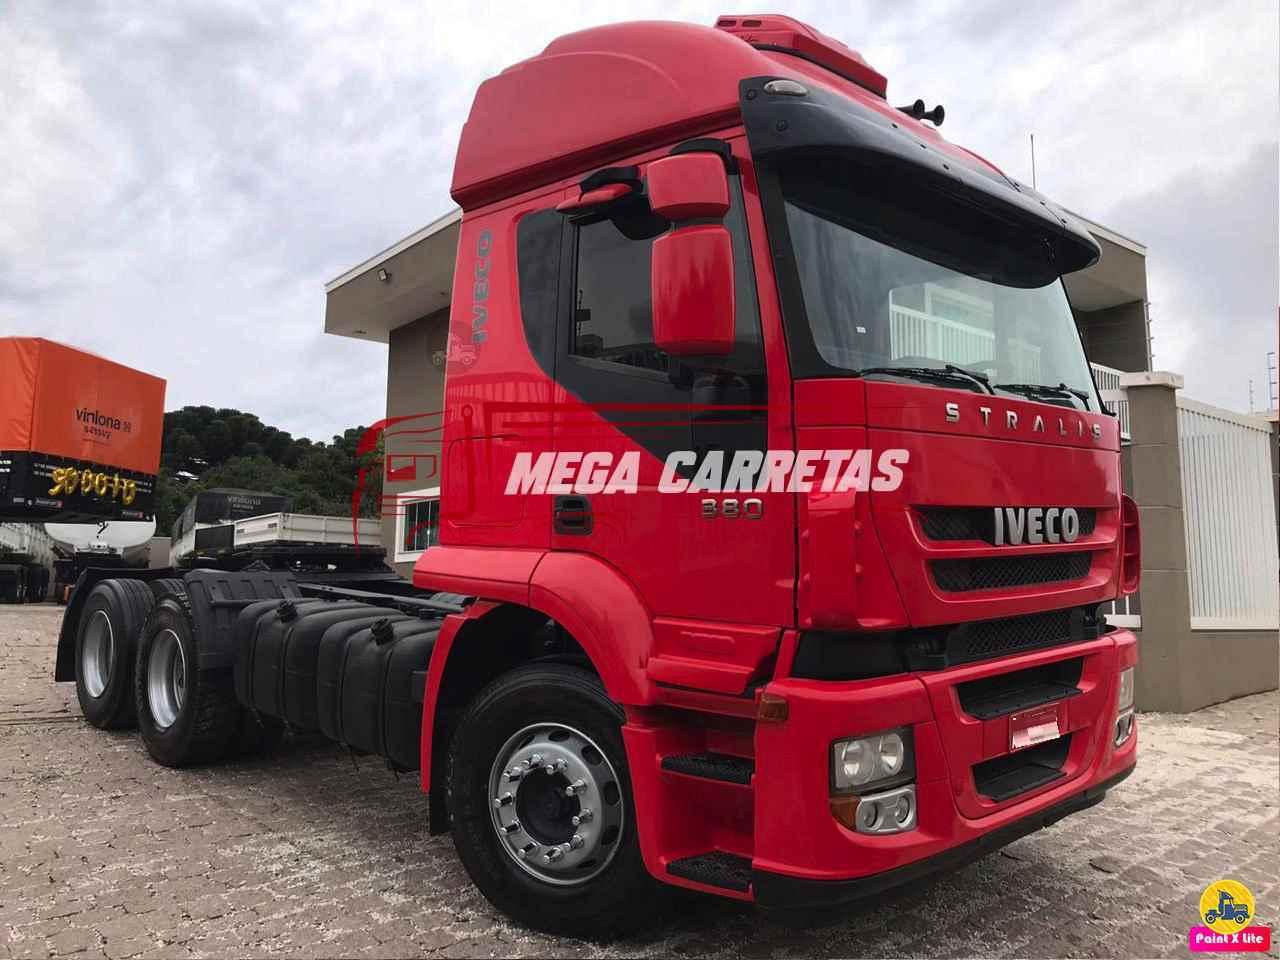 IVECO STRALIS 380 780000km 2010/2010 Mega Carretas